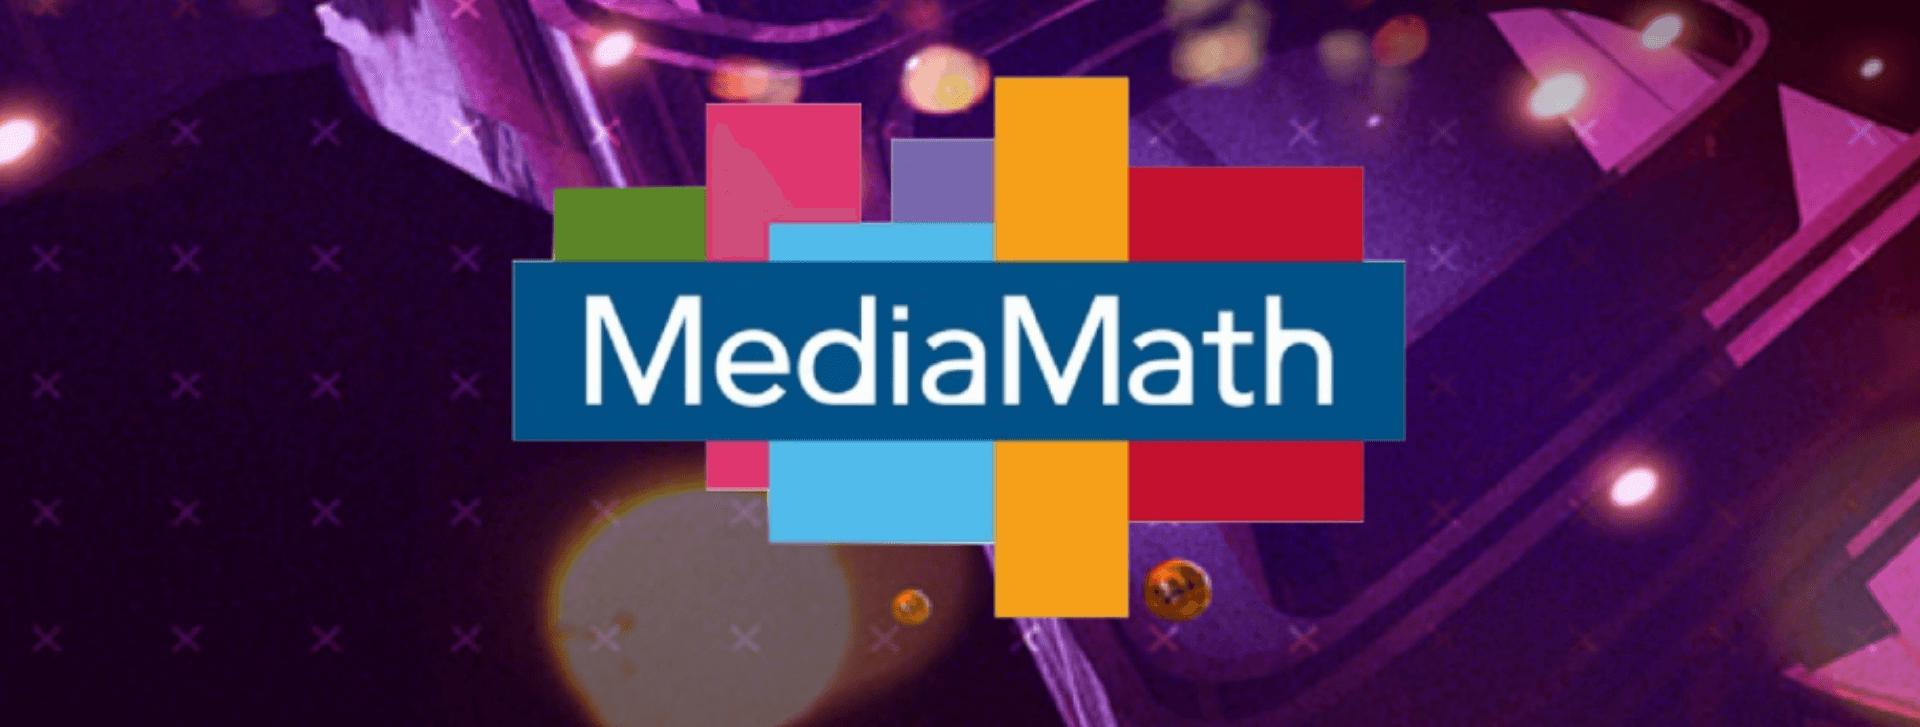 MediaMath - Featured image